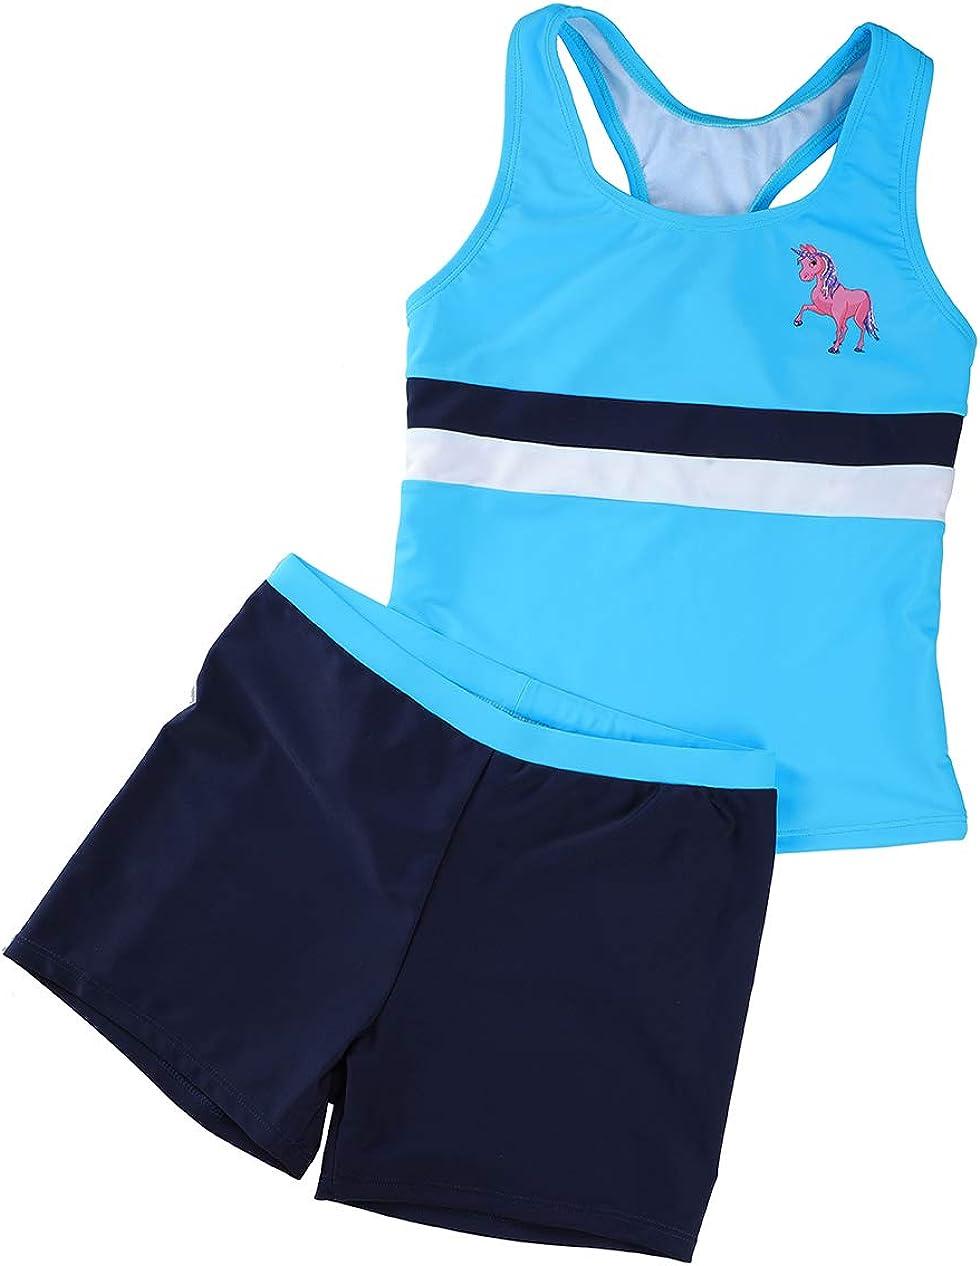 BELLOO Girls Two Piece Boyshort Tankini Sets Kids Swimsuits 14-16